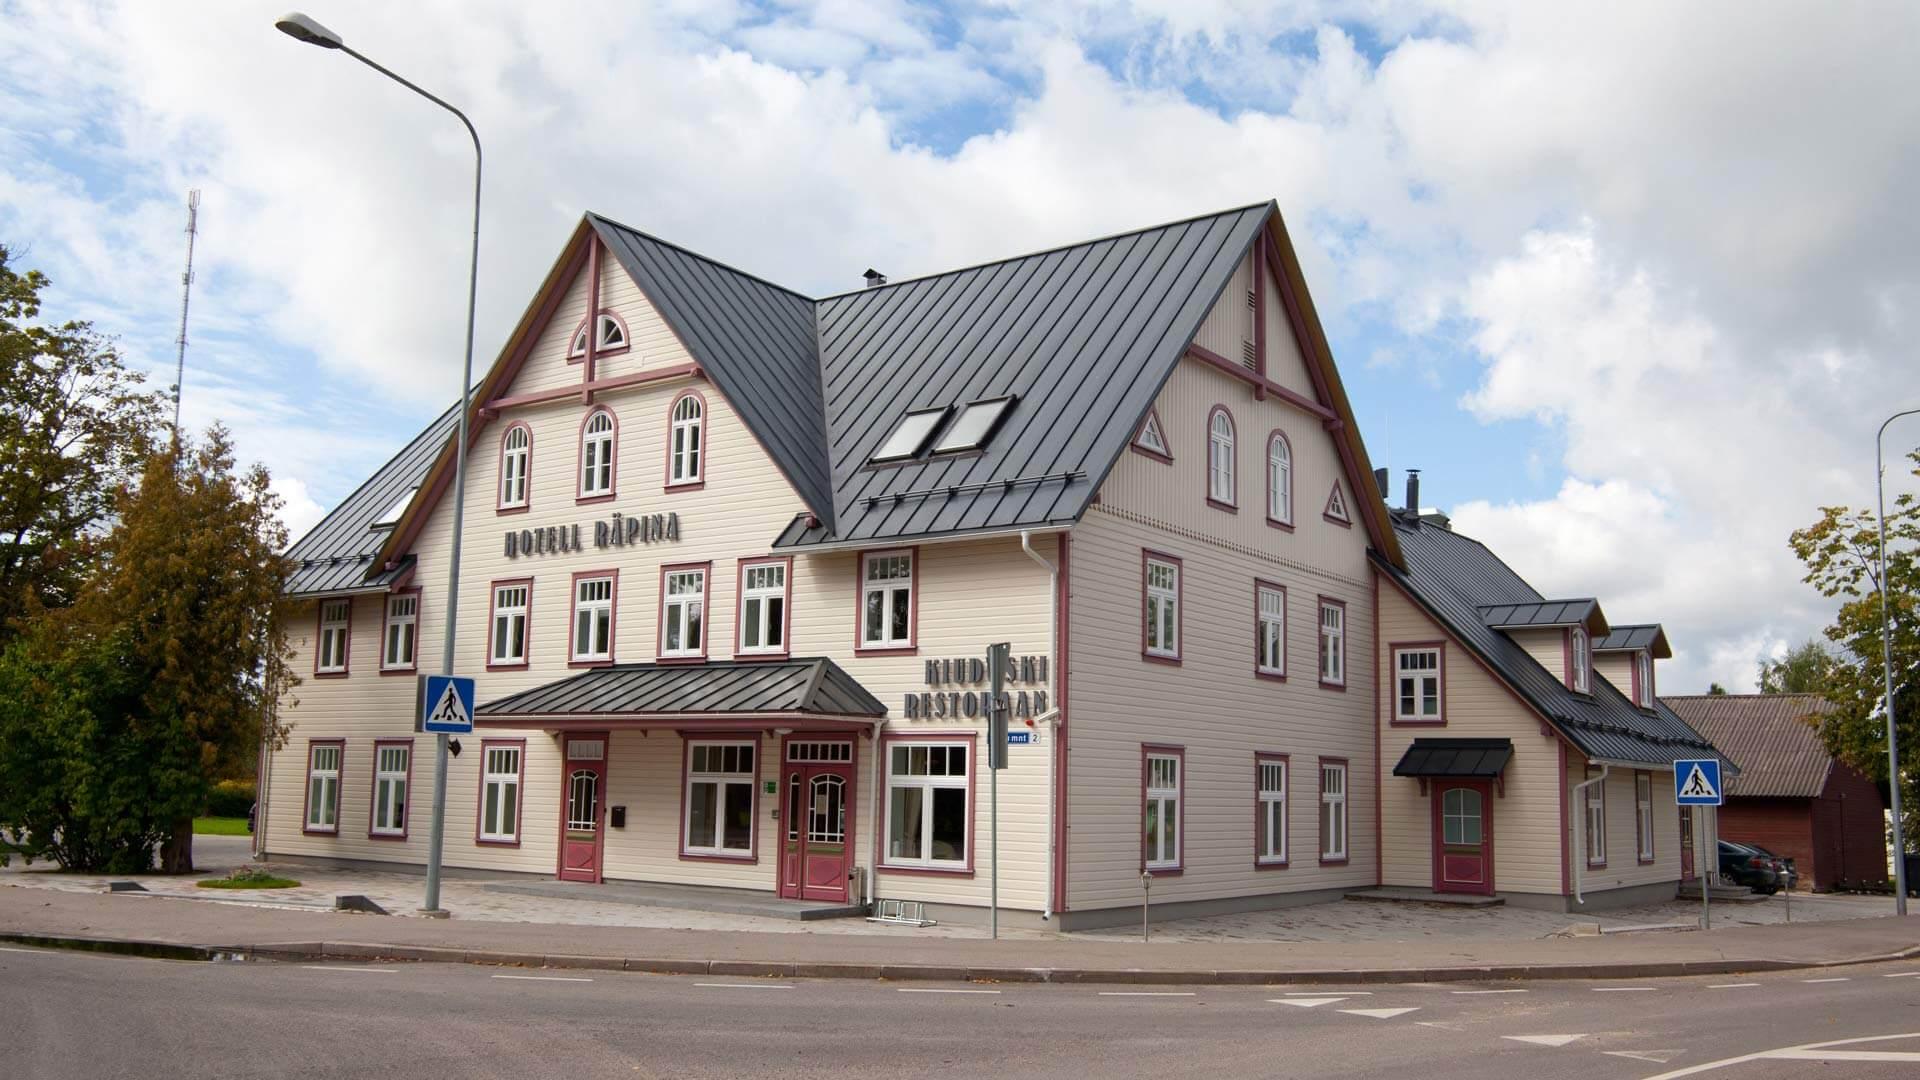 Räpina hotell |Hubane perehotell Räpinas | Kagu-Eesti